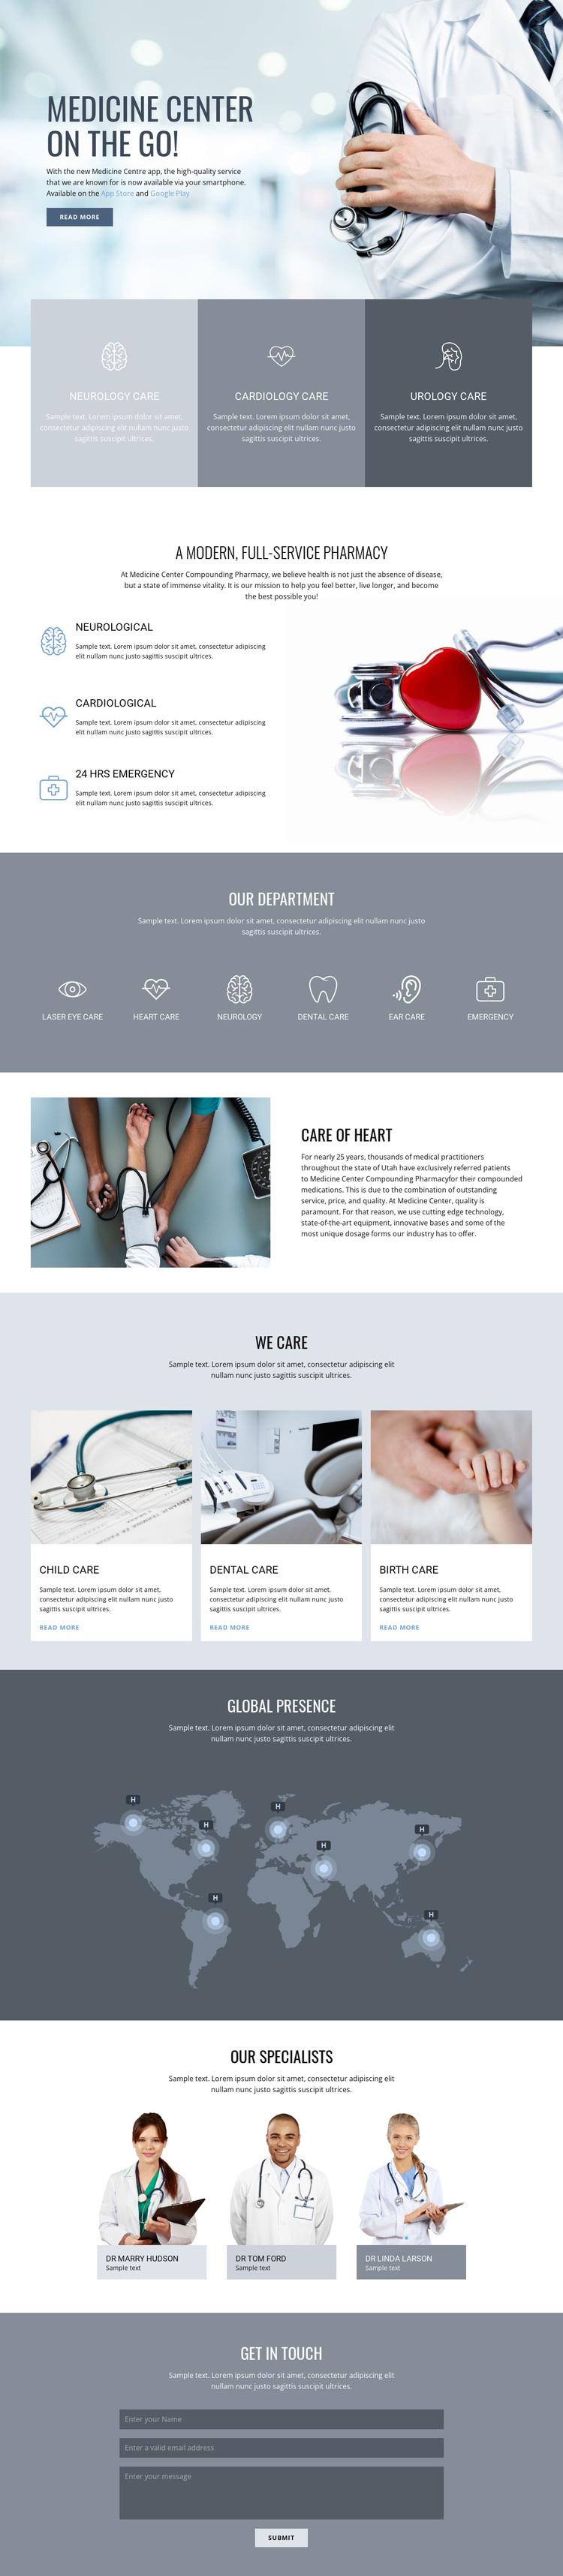 Center of quality medicine Joomla Page Builder